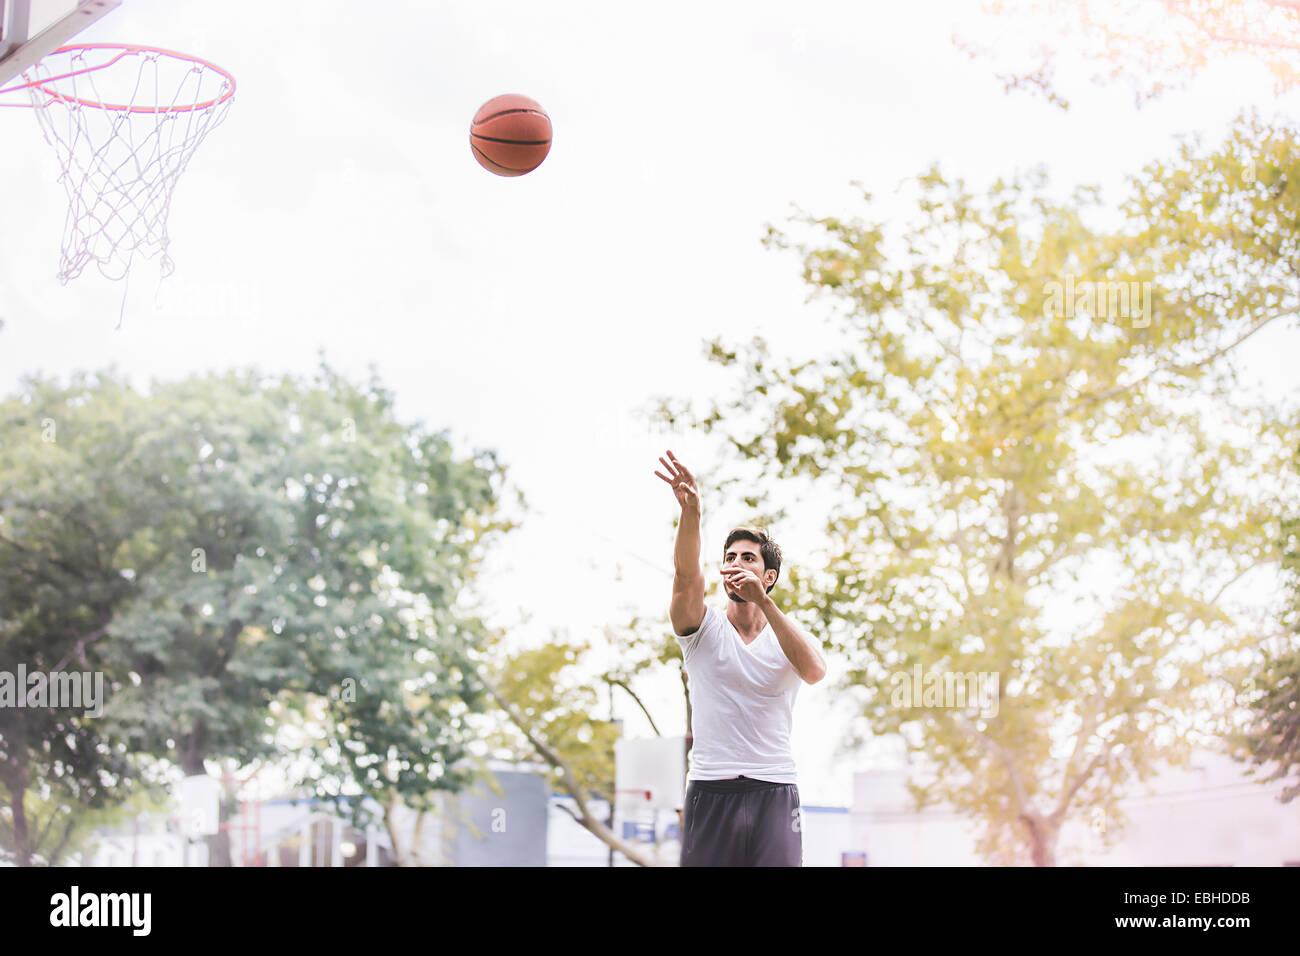 Young male basketball player throwing ball towards basketball net - Stock Image